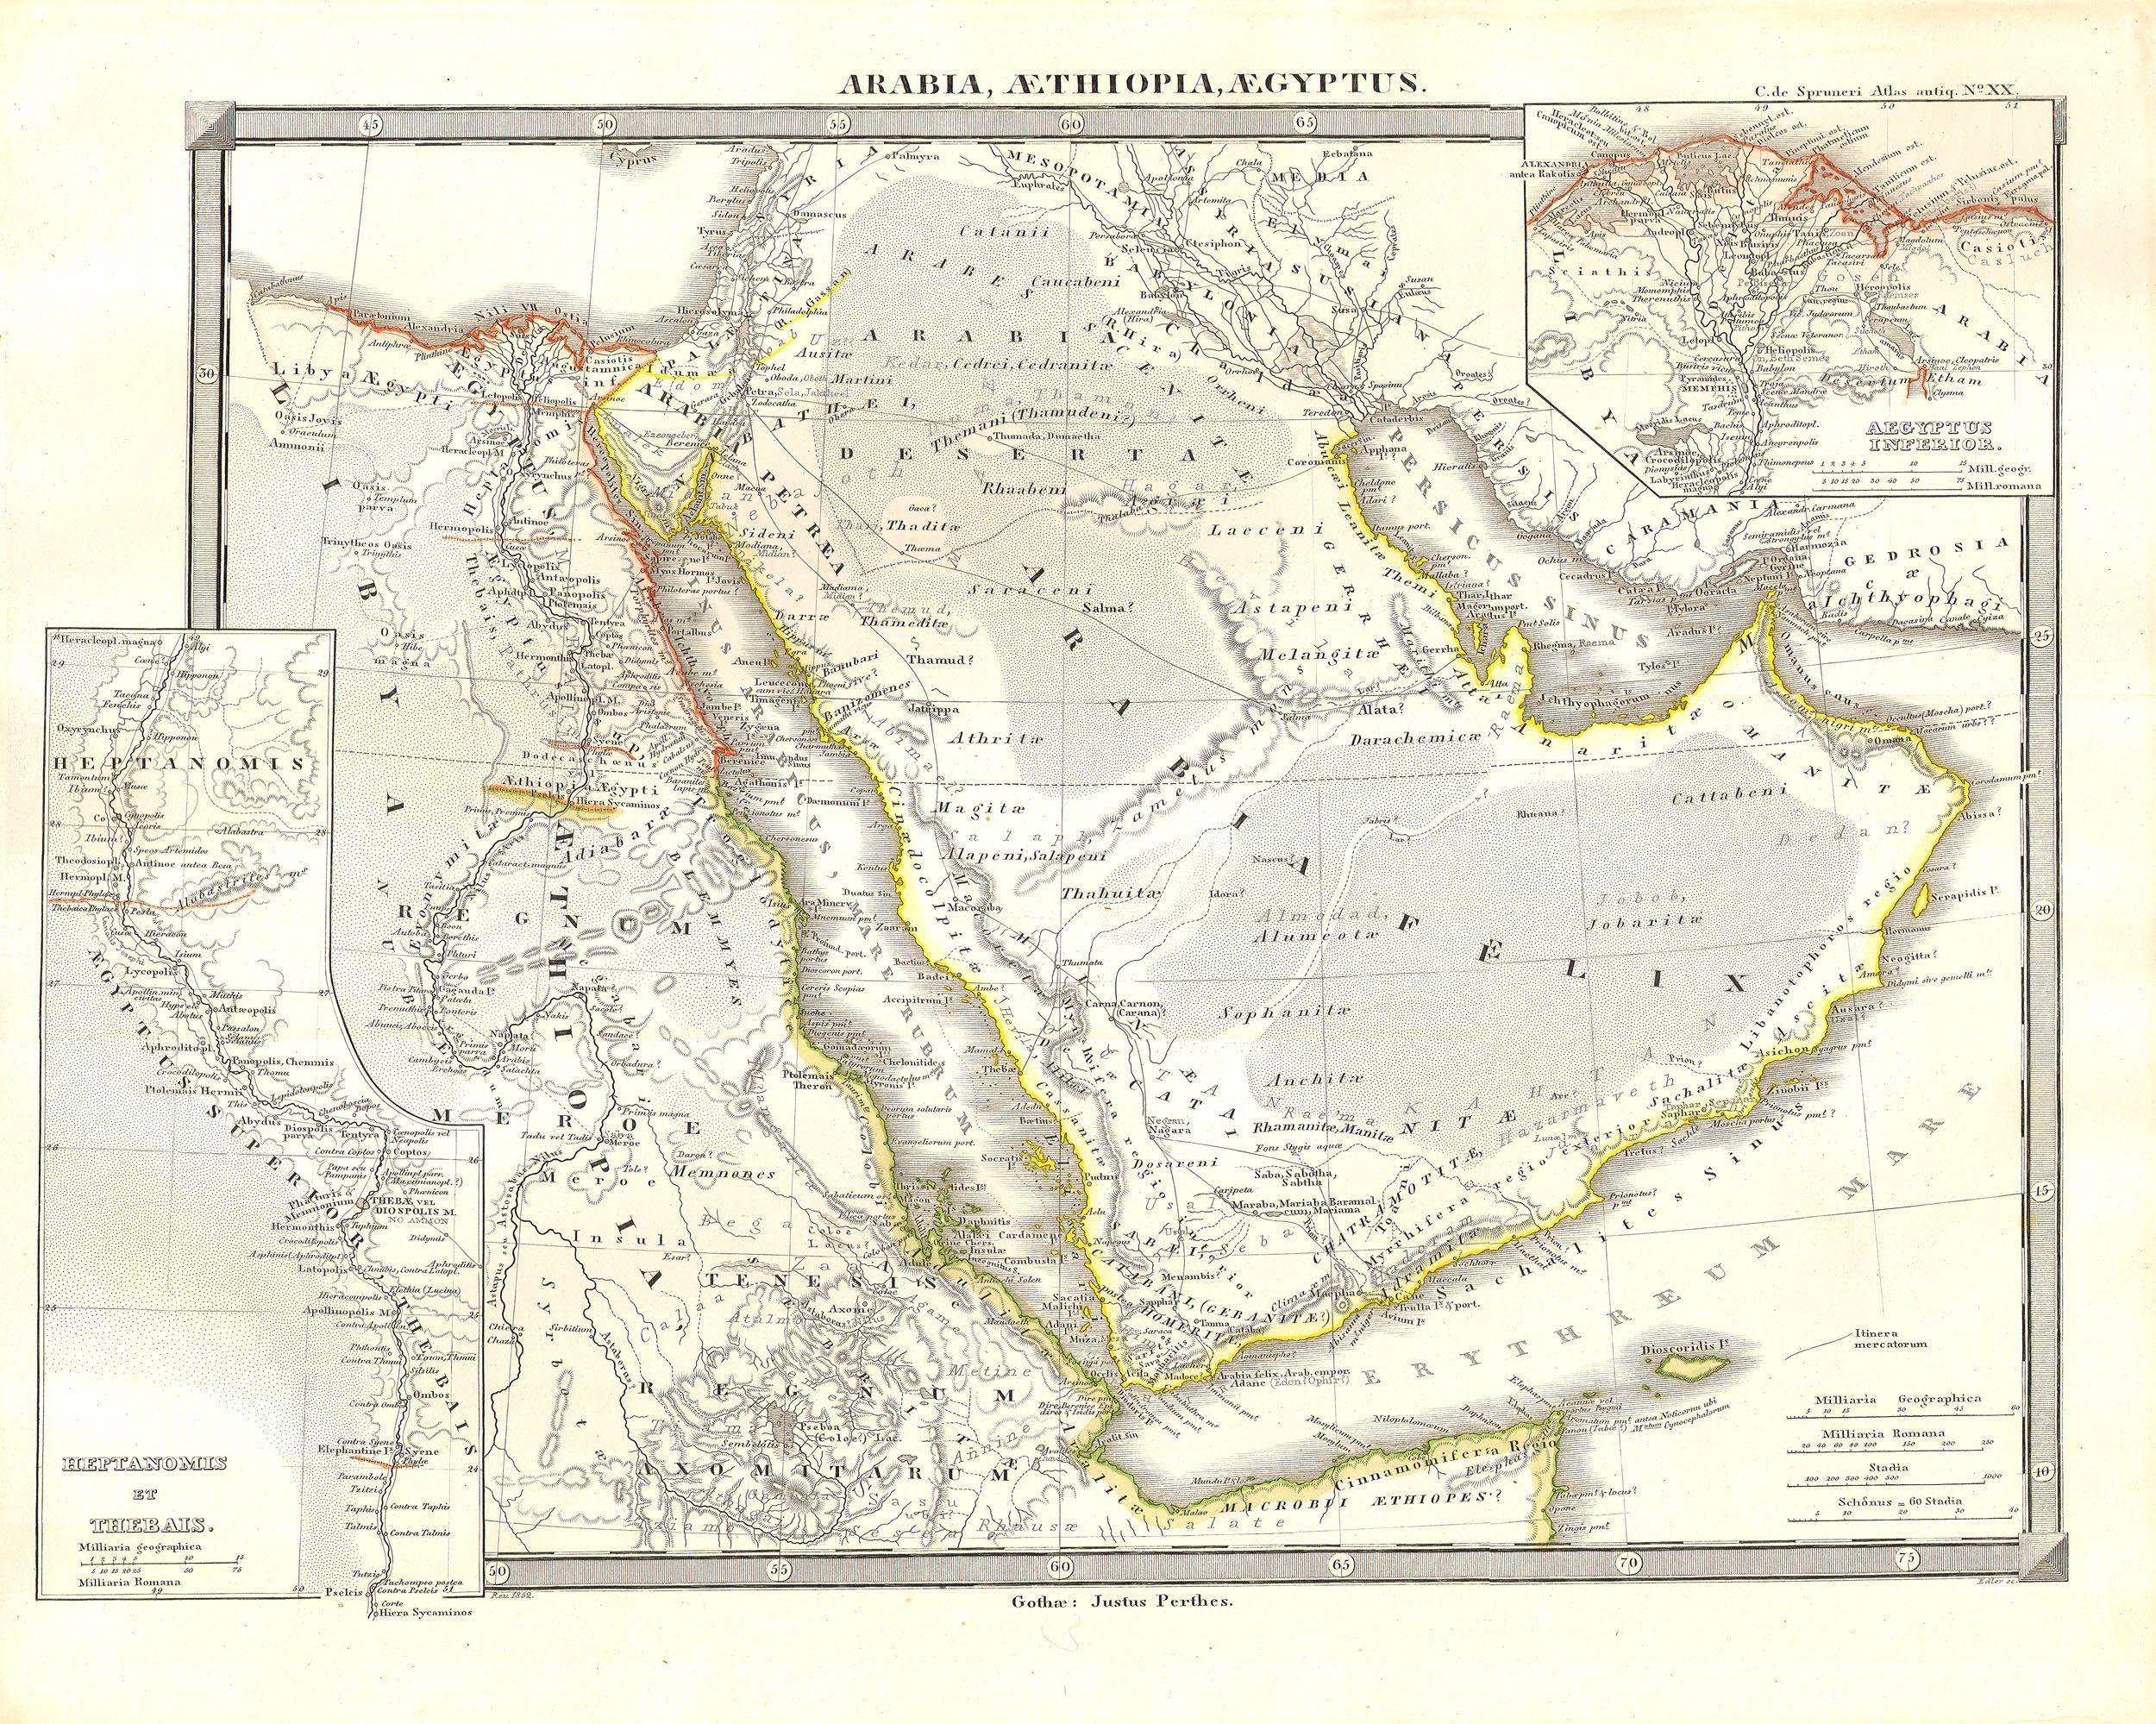 File Spruneri Map Of Arabia Egypt And Ethiopia Or Abyssinia - Map of egypt ethiopia